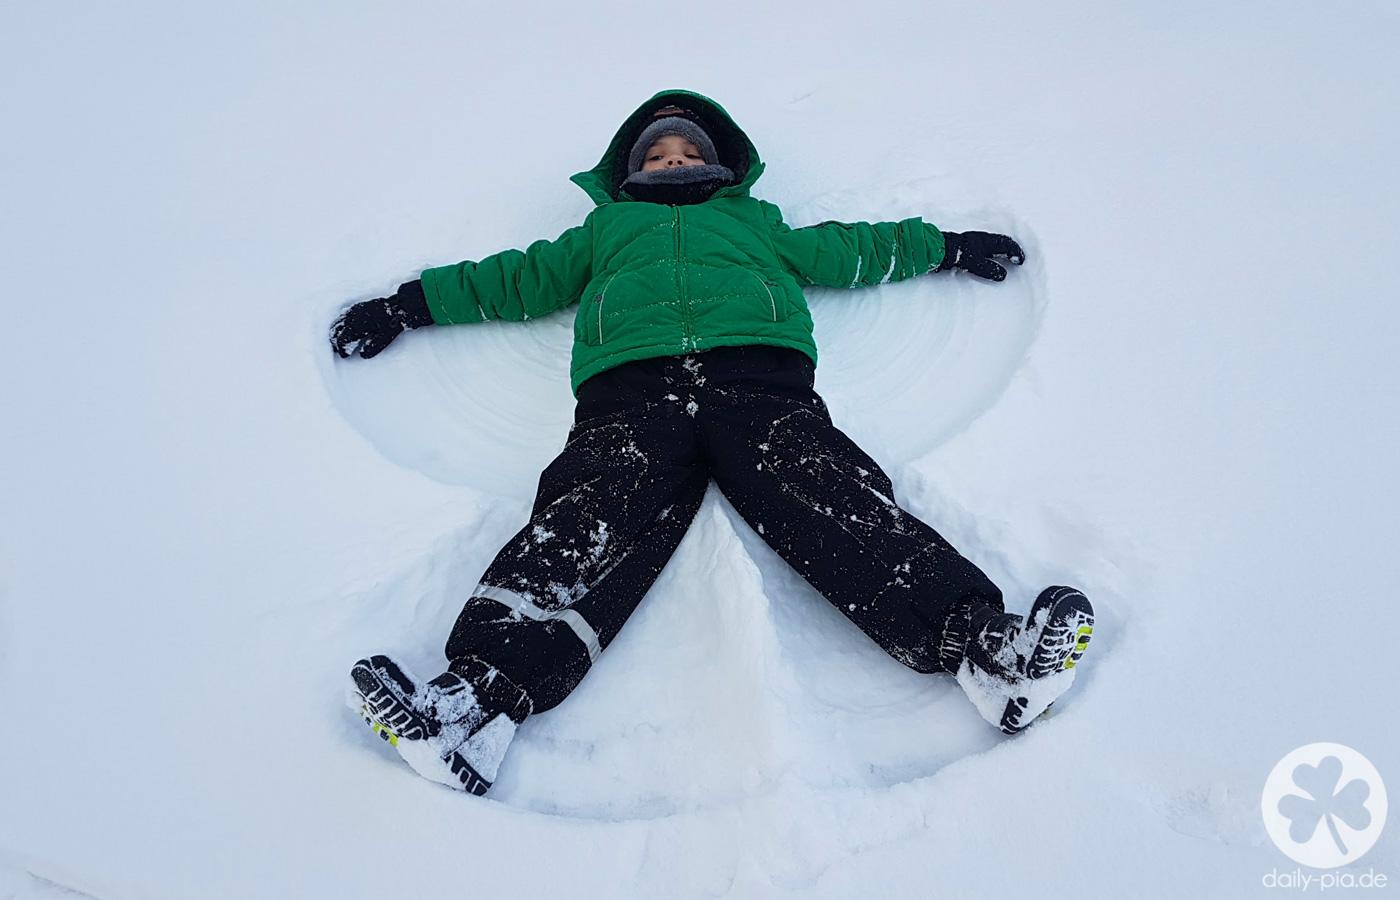 Winterurlaub 2017 – Reisetagebuch Tag 7